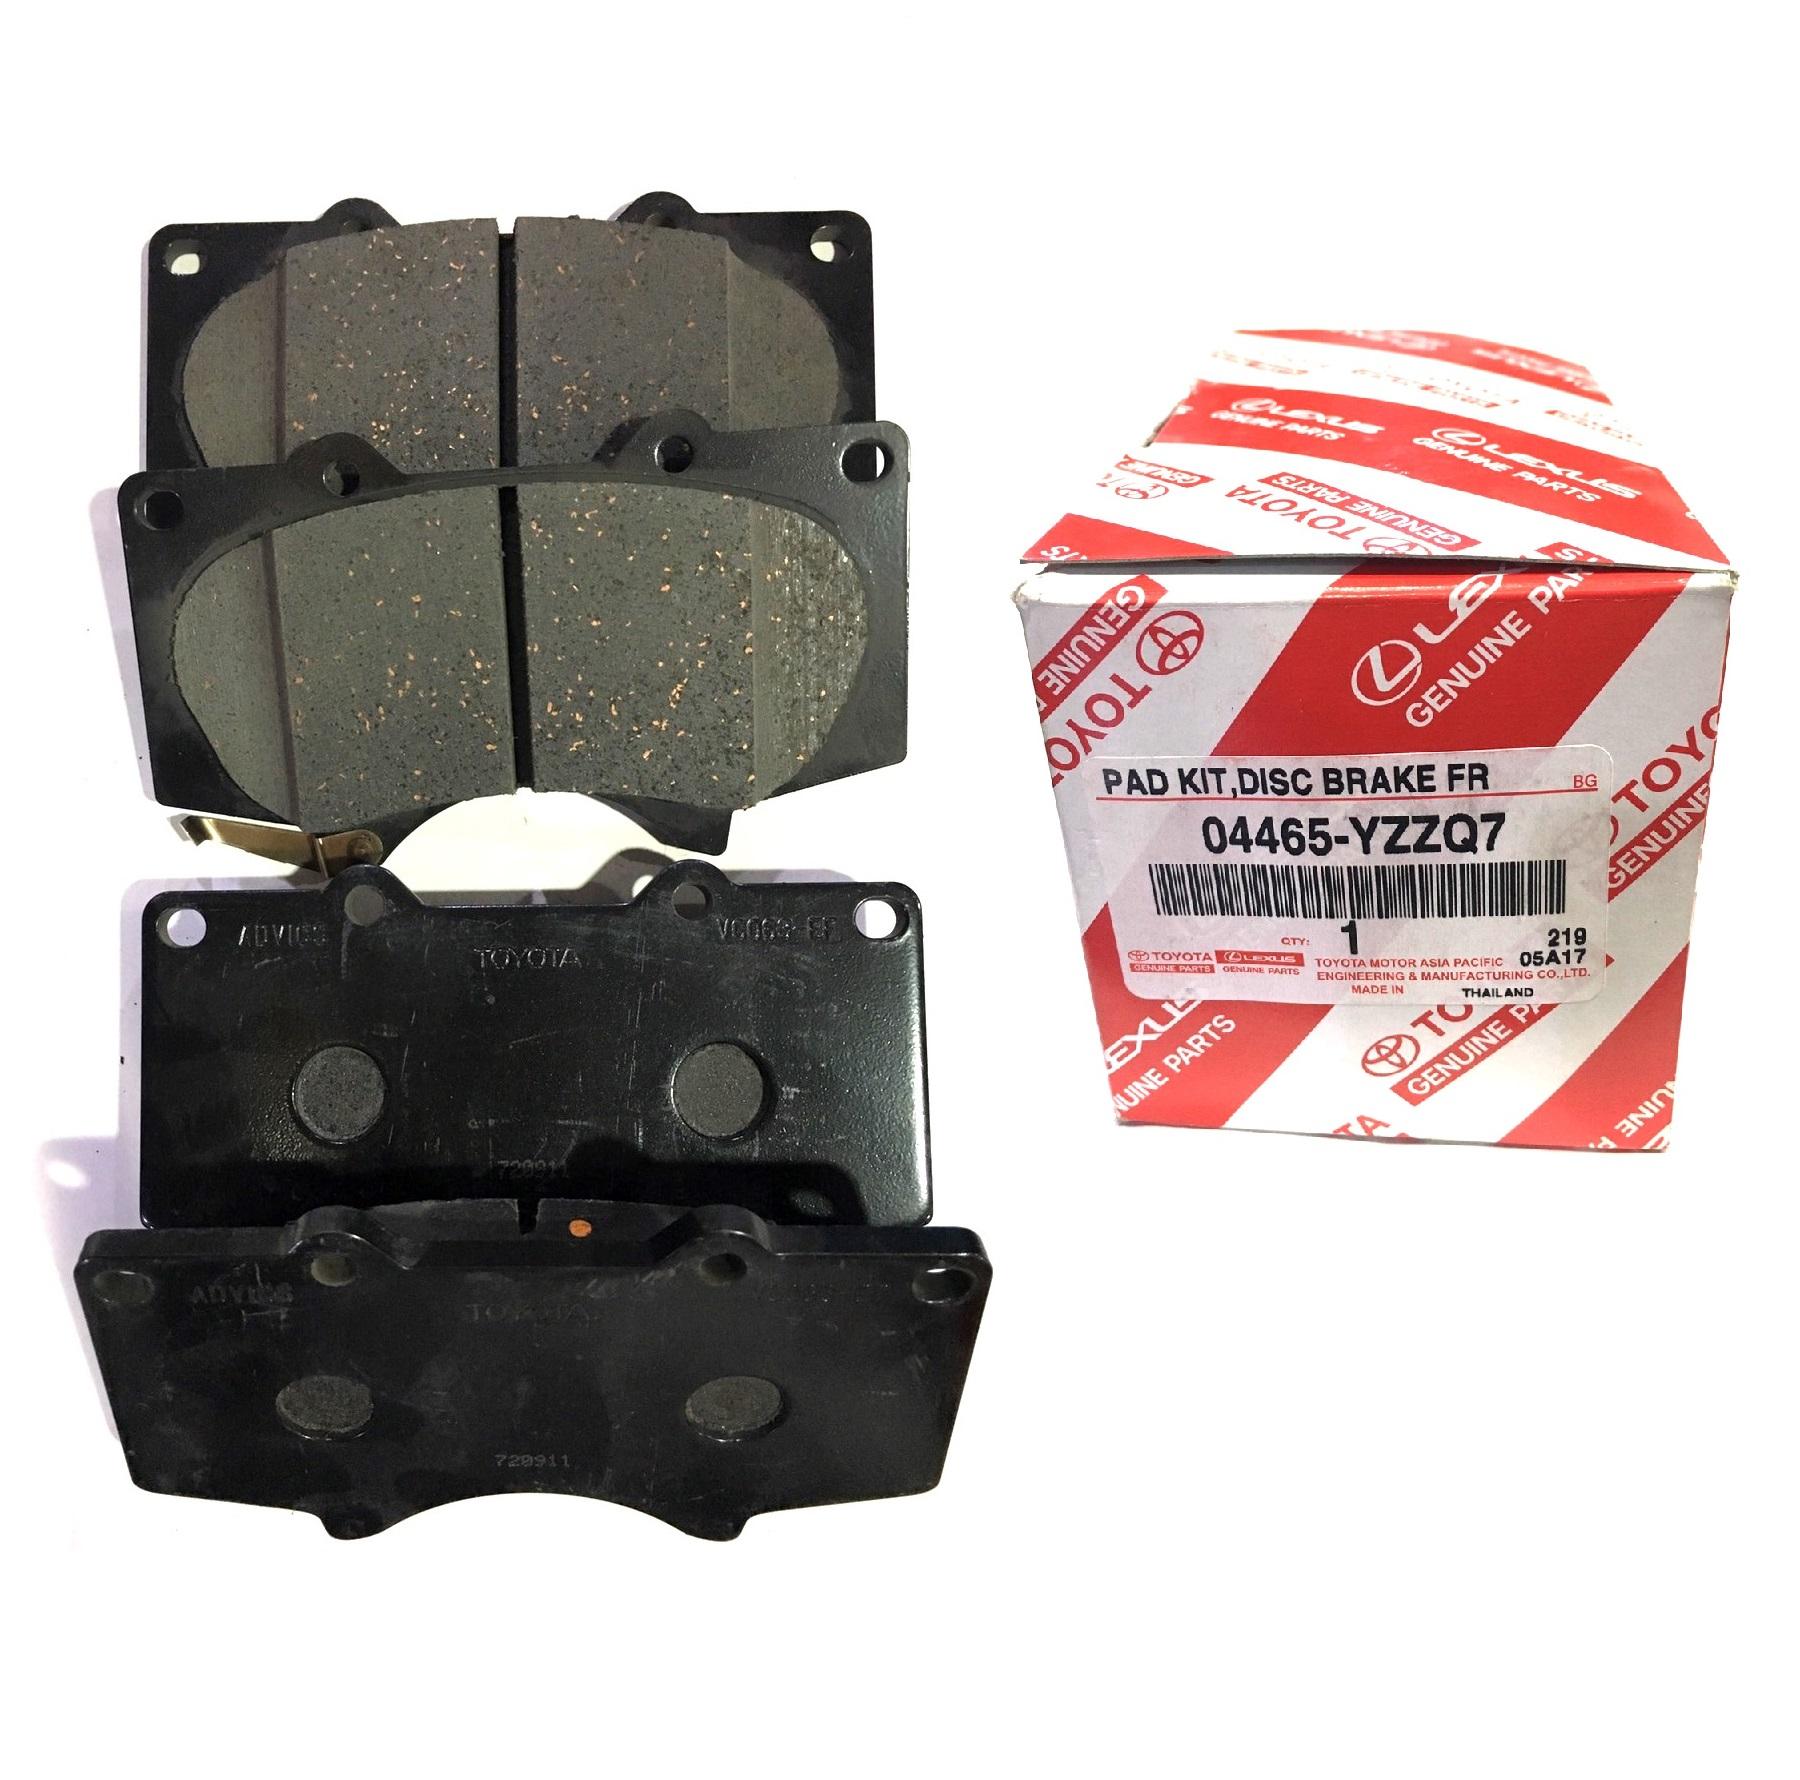 Toyota Brake Pads >> Genuine Oem Front Disc Brake Pads Kit 2004 2015 Toyota Hilux Vigo